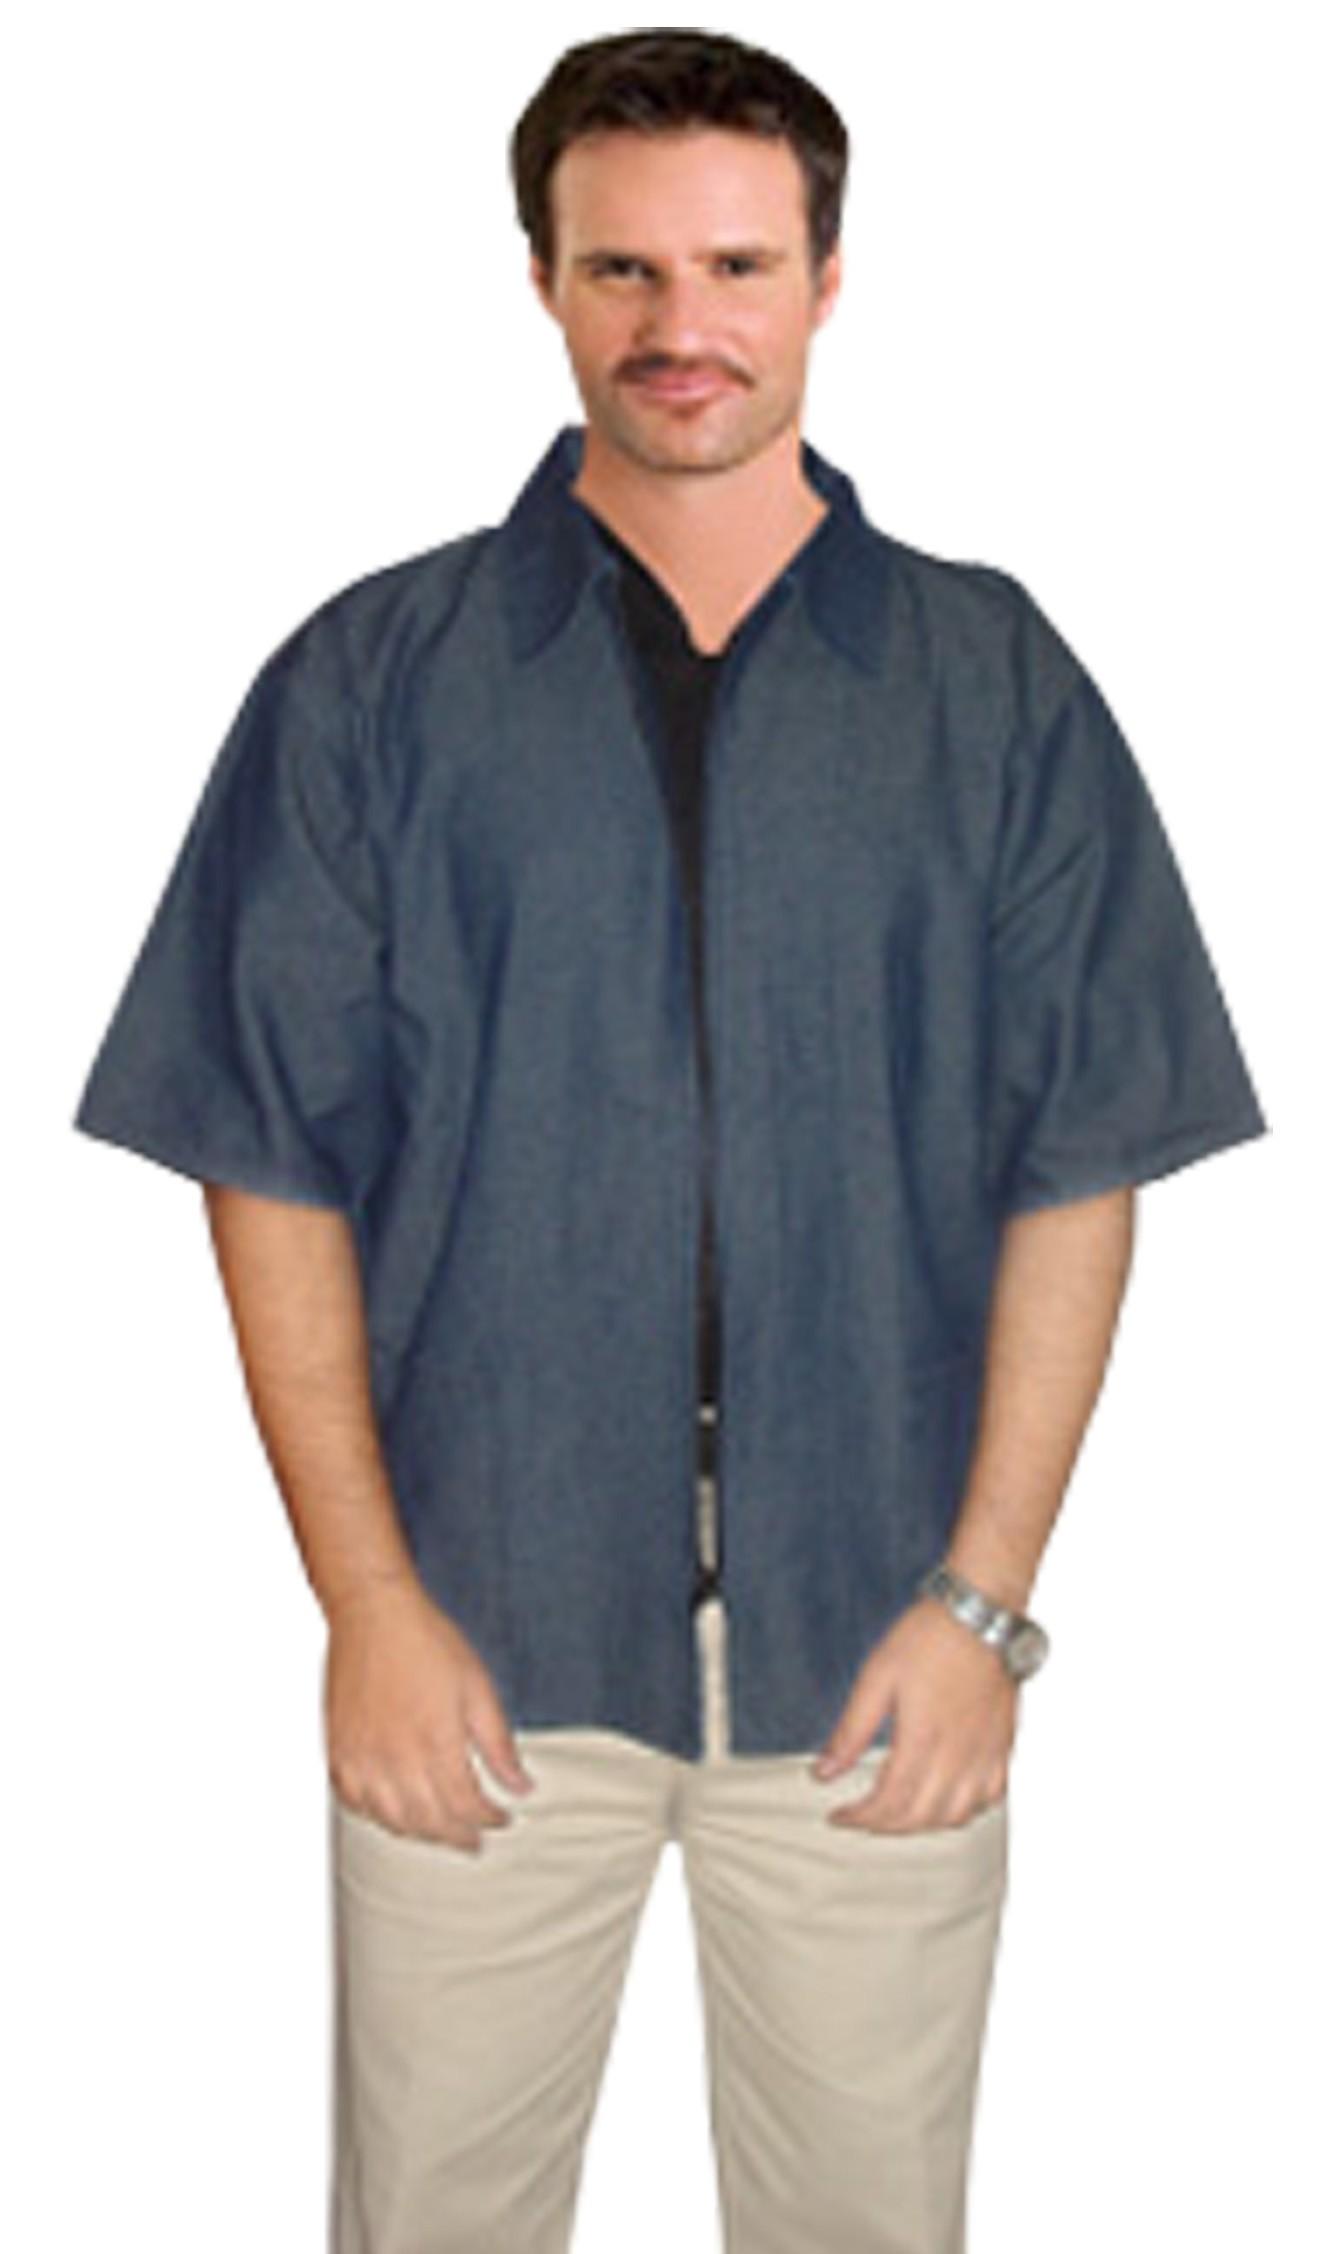 Denim barber jacket 2 pockets half sleeve with zipper dark shade